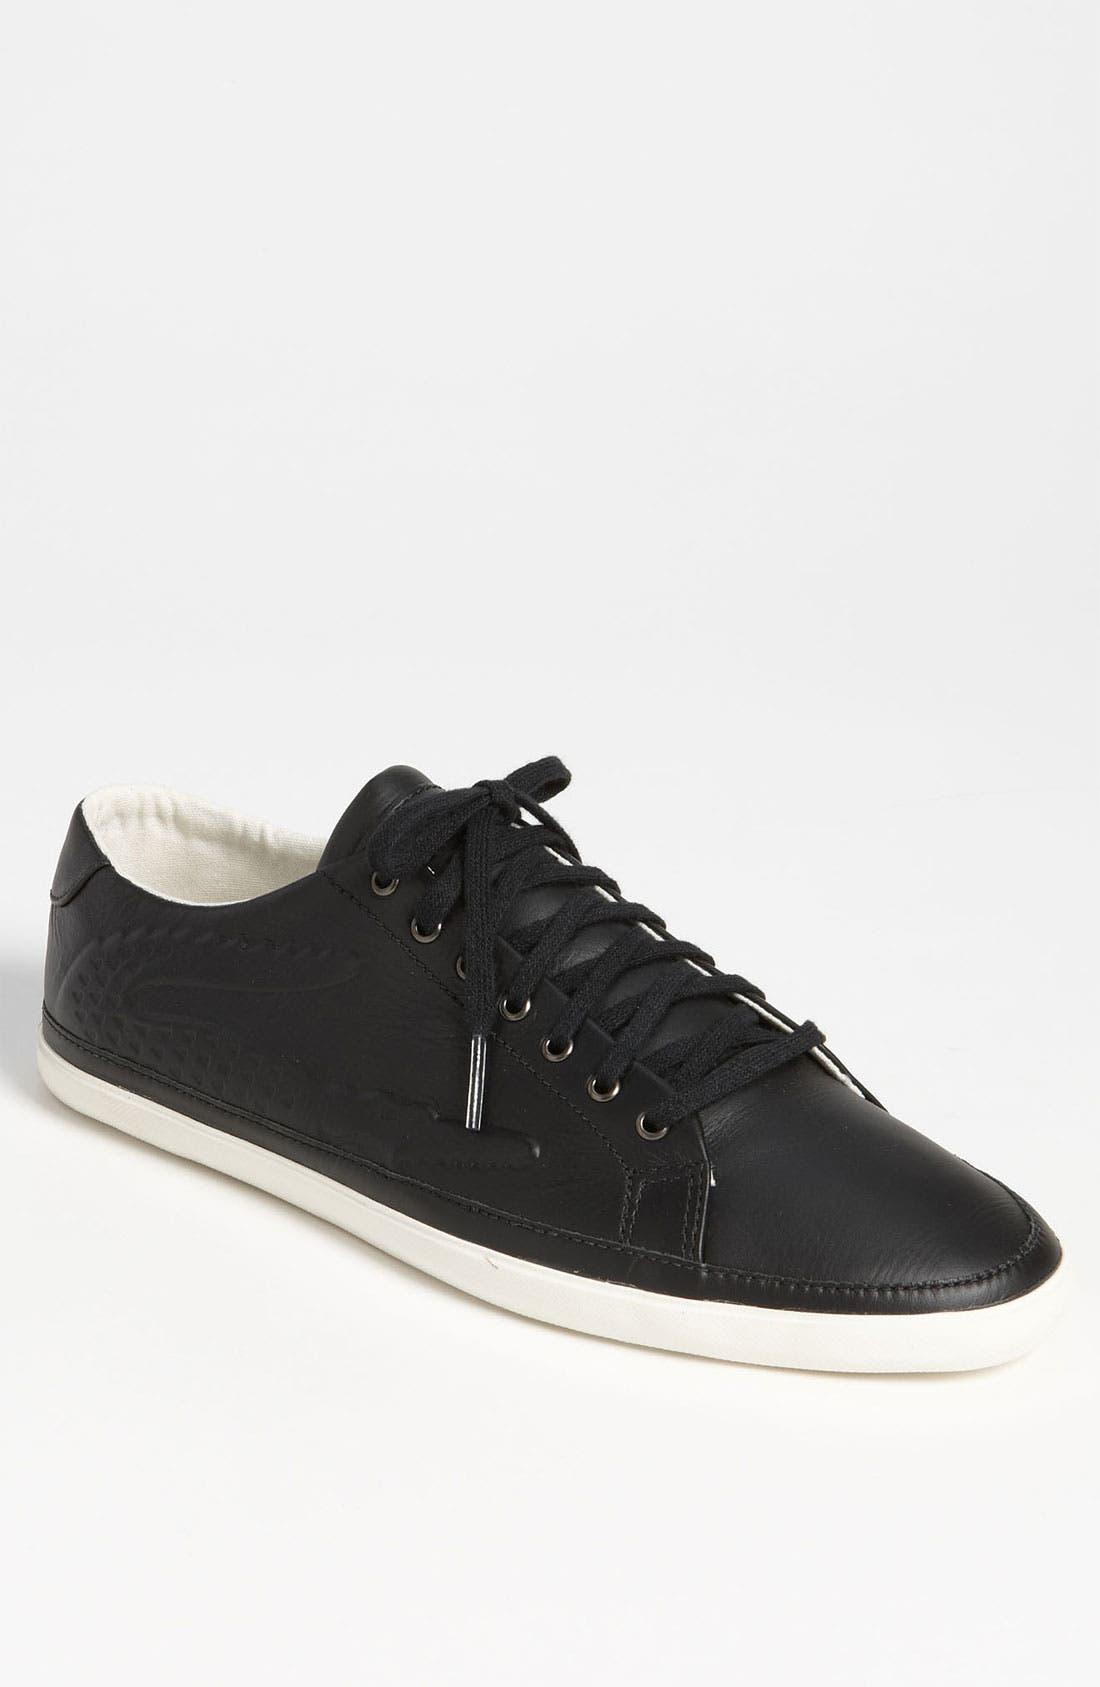 Alternate Image 1 Selected - Lacoste 'Bocana' Sneaker